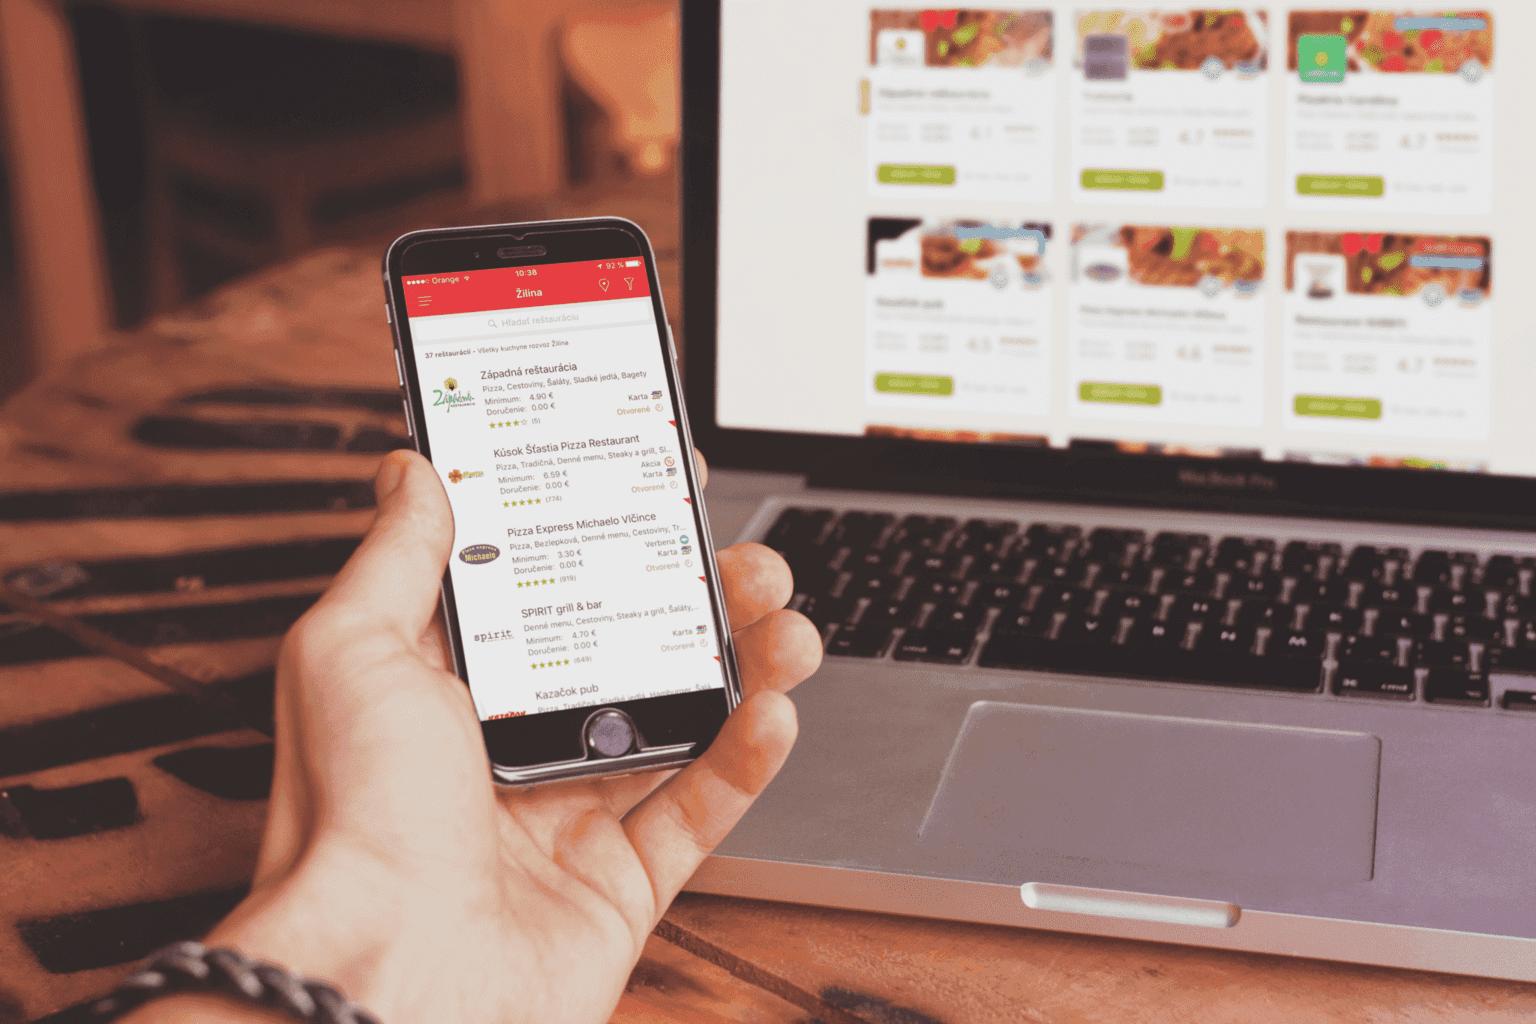 mobilna-aplikacia-vs-responzivna-webstranka